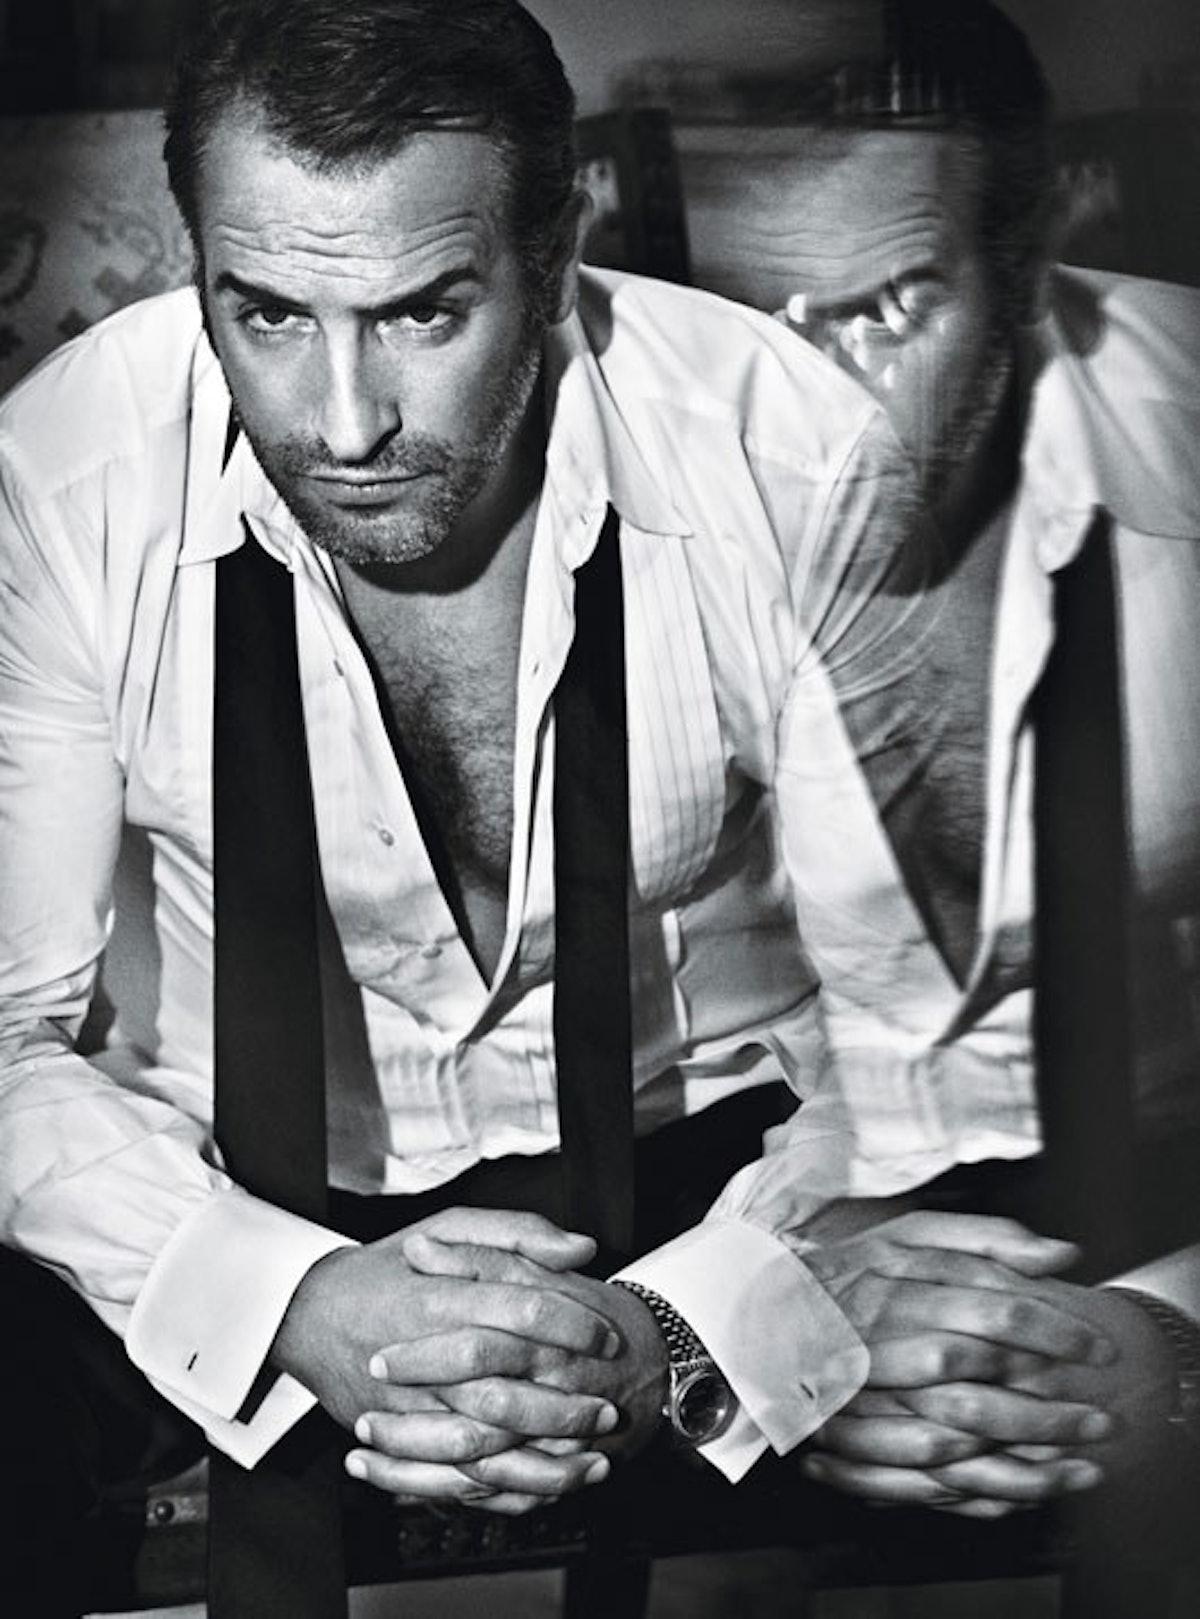 cess-best-performances-actor-portfolio-2012-04-l.jpg